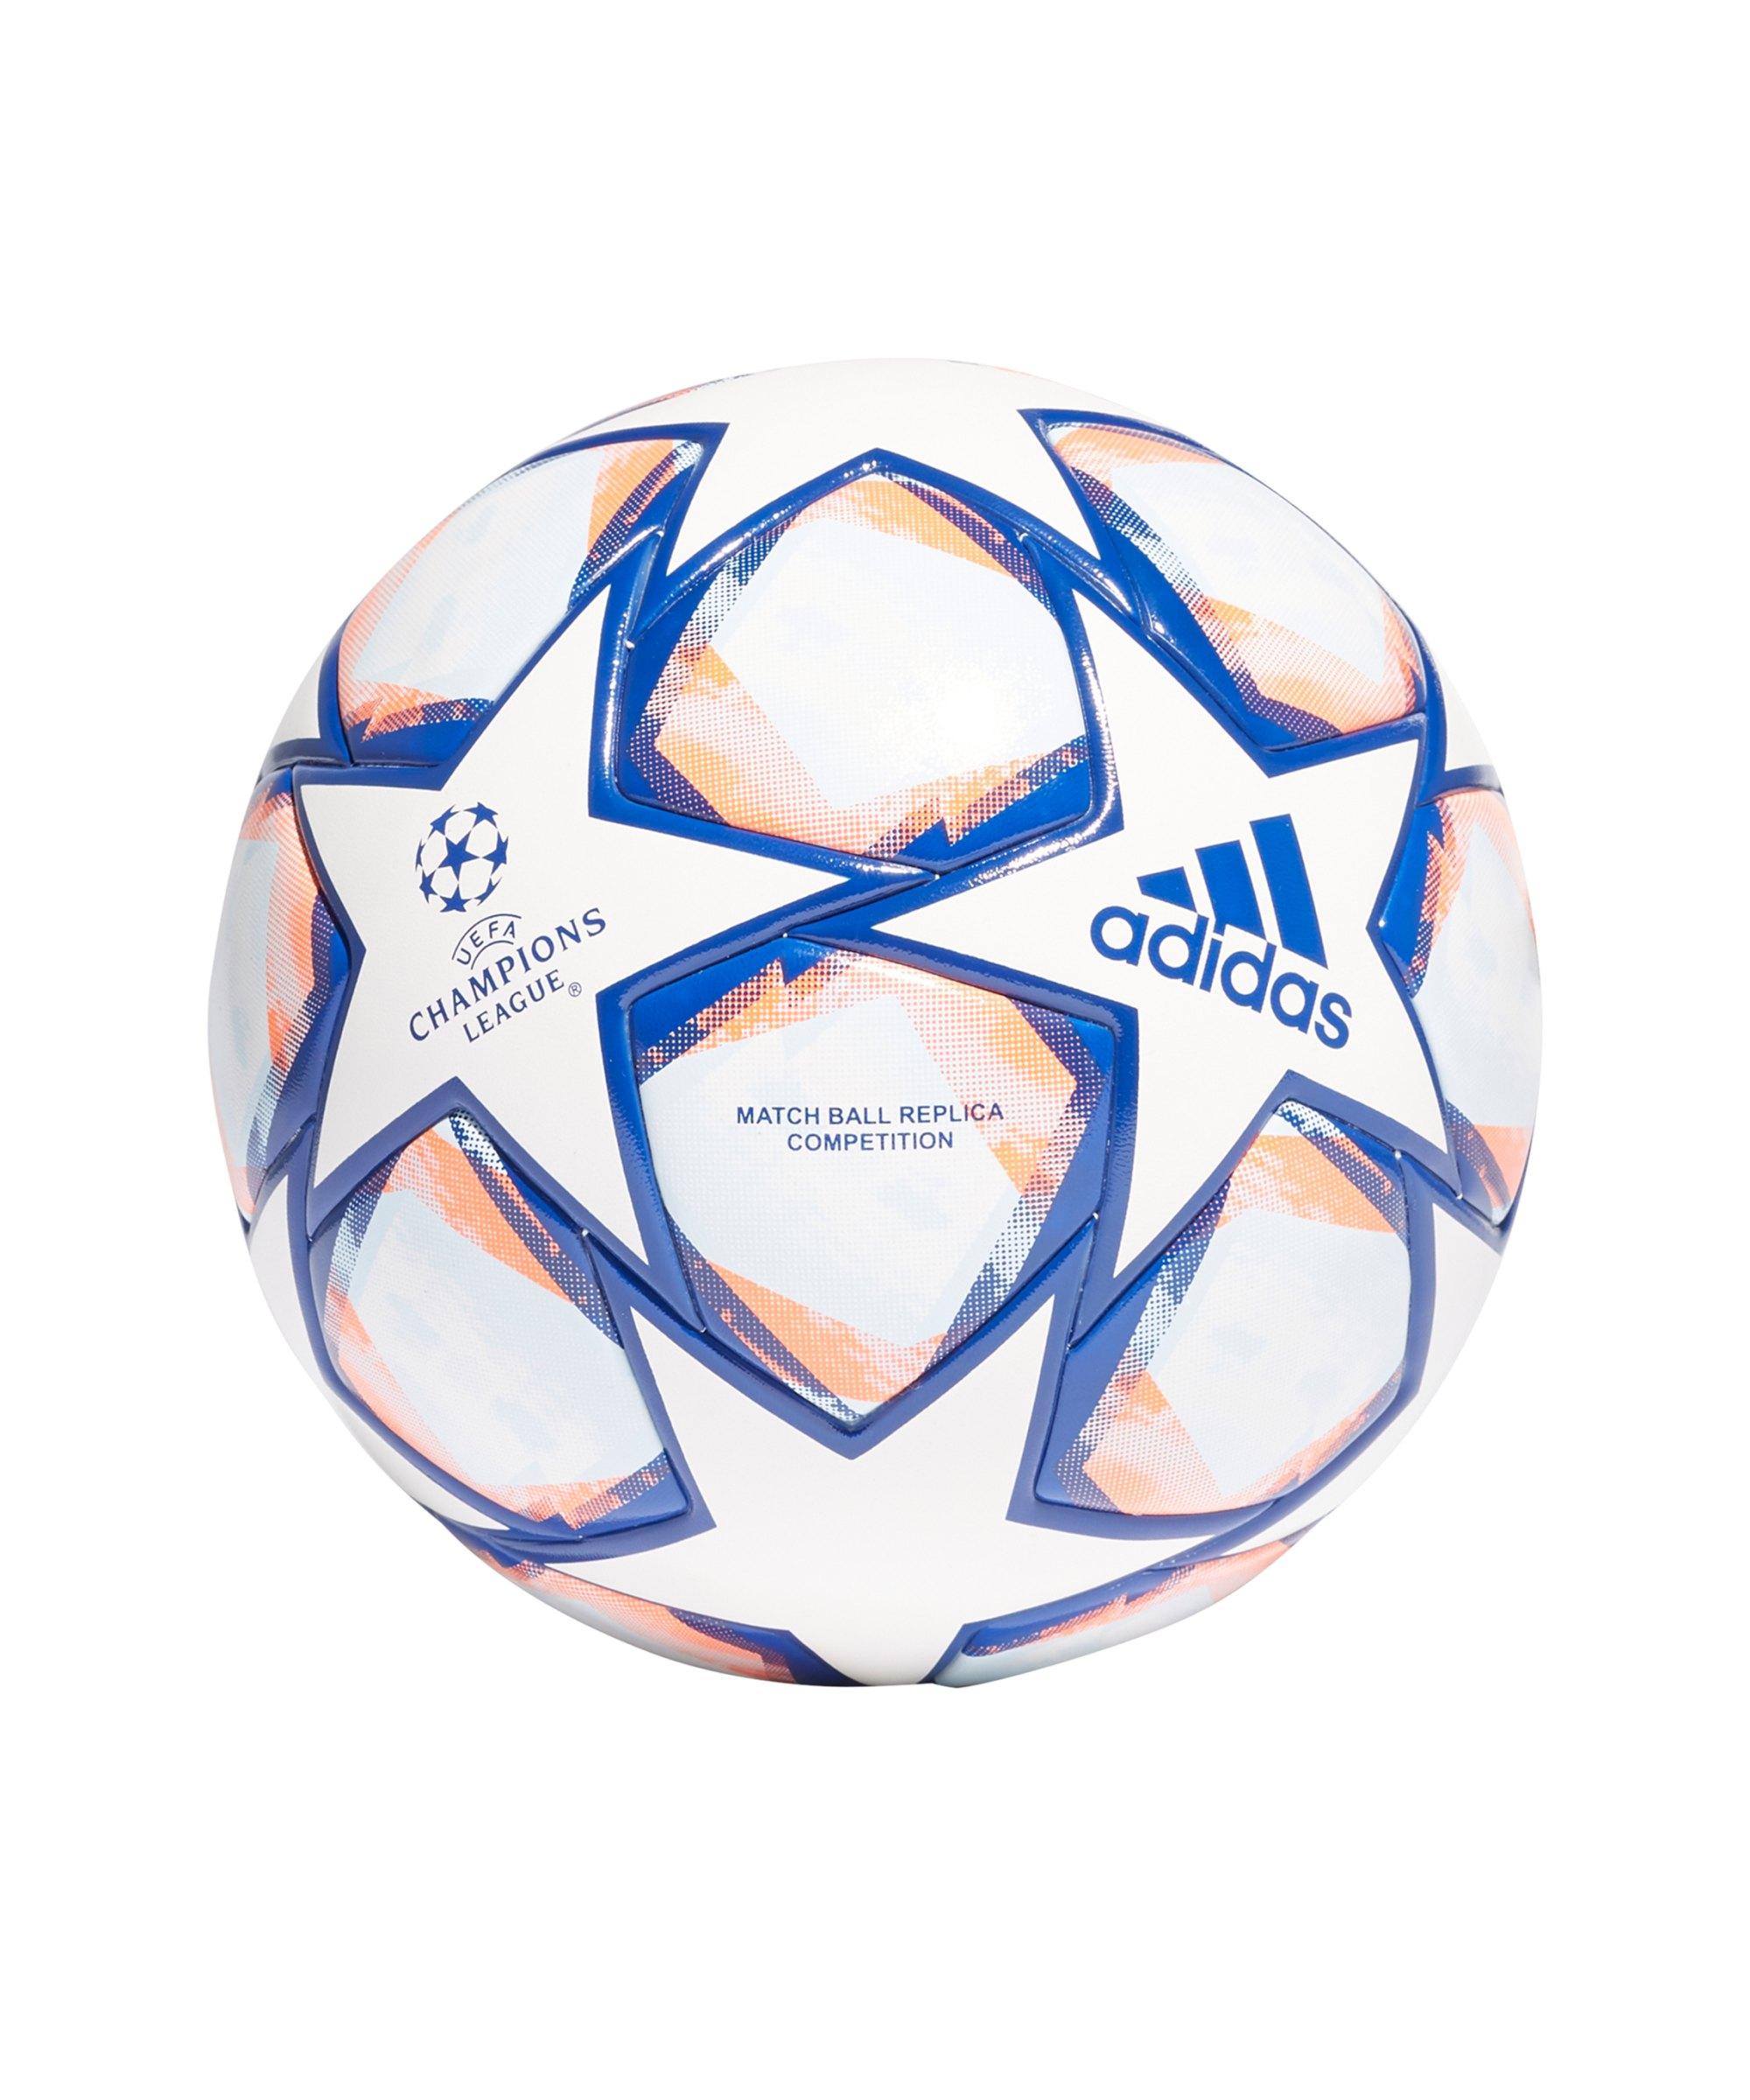 adidas Champions League Finale COM Spielball Weiss Blau Orange - weiss